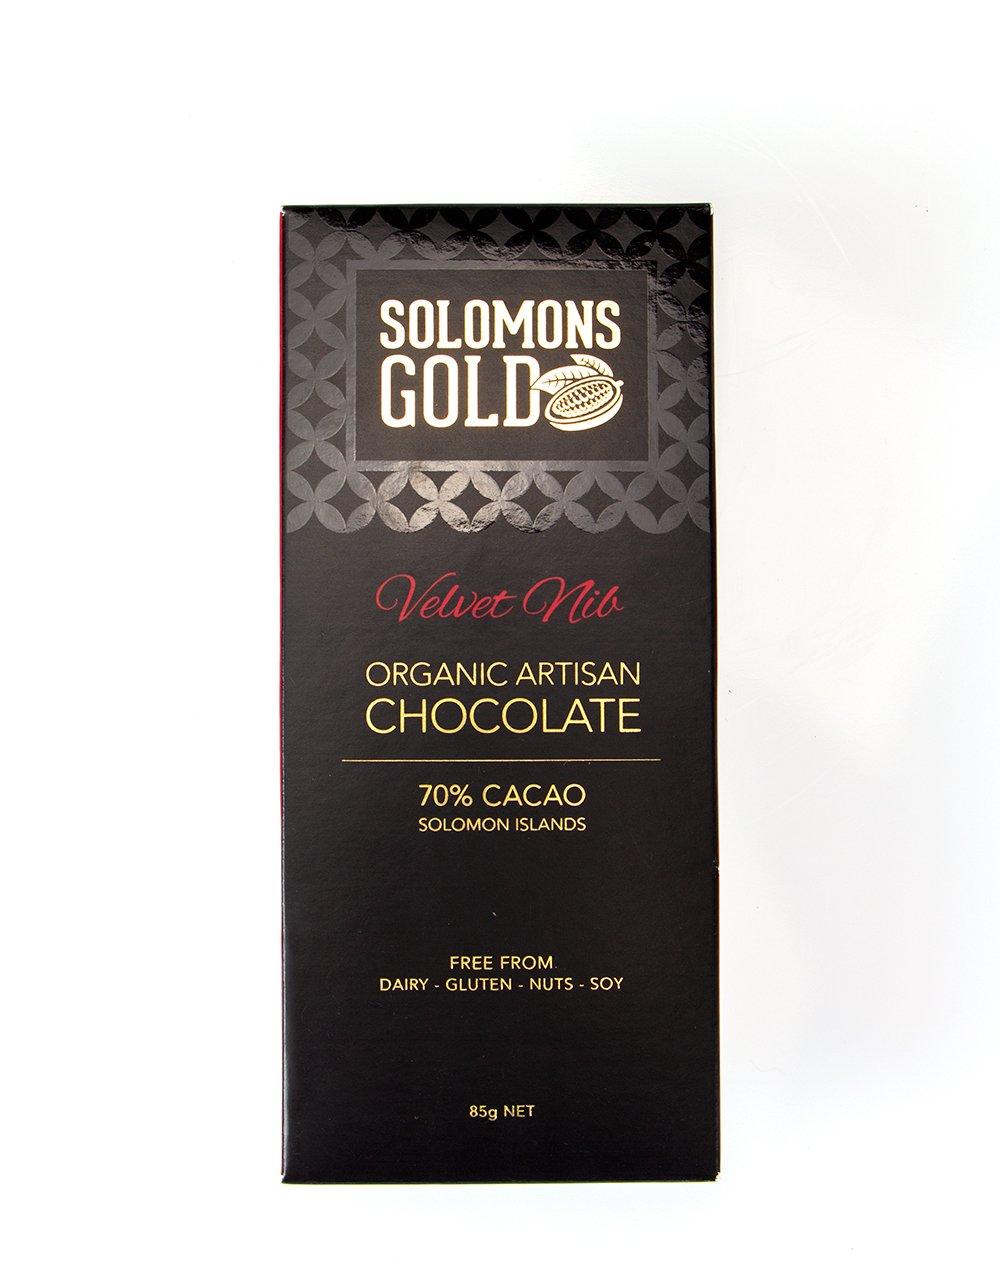 Solomons Gold Velvet Nib Organic Artisan Chocolate 70% Cacao 85g